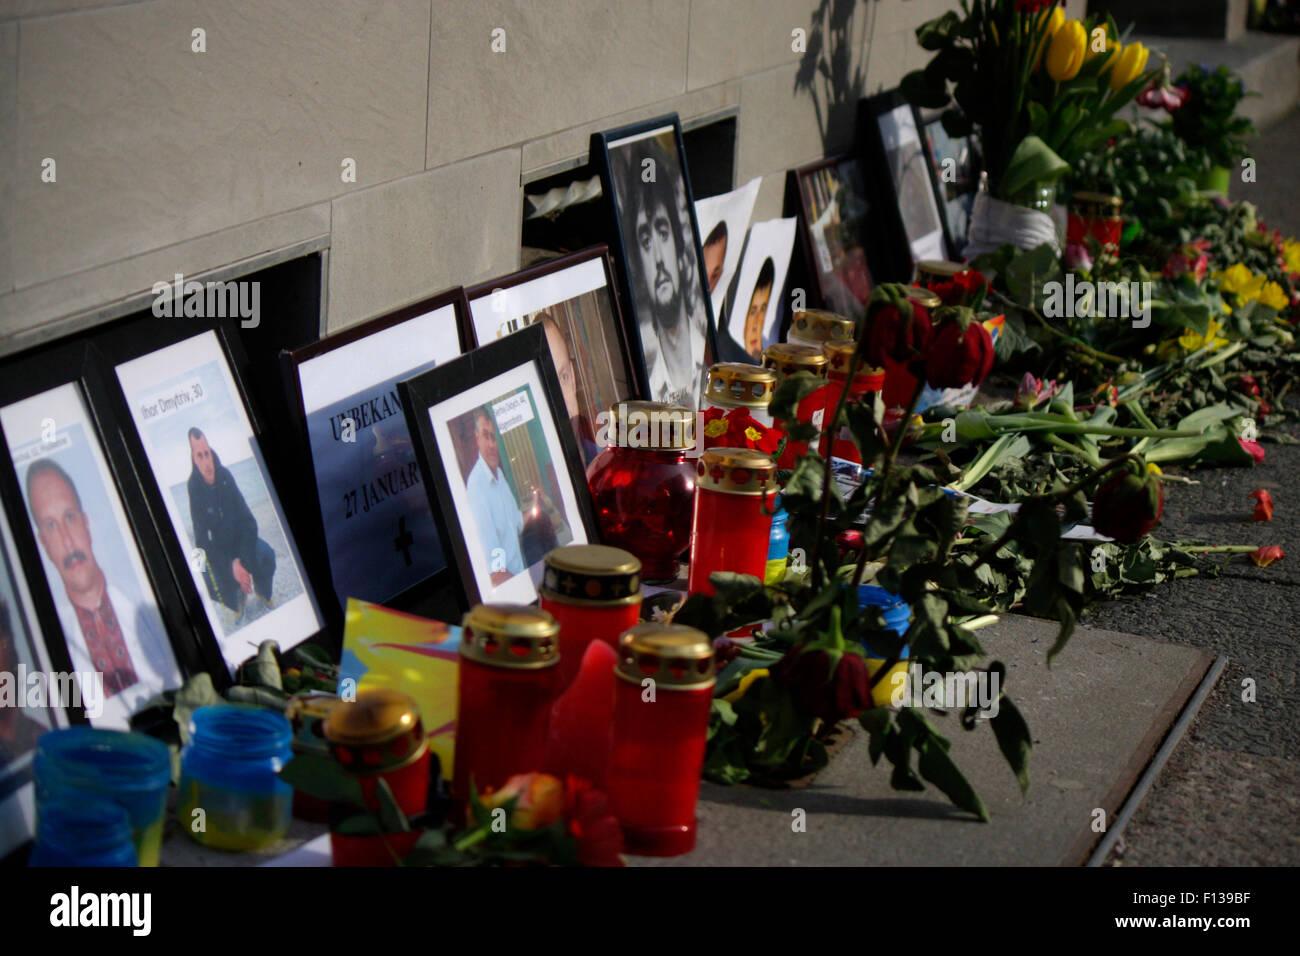 Bilder der am Maidan Platz in Kiew getoeteten Demonstranten an der ukrainischen Botschaft, 1. Maerz 2014, Berlin - Stock Image